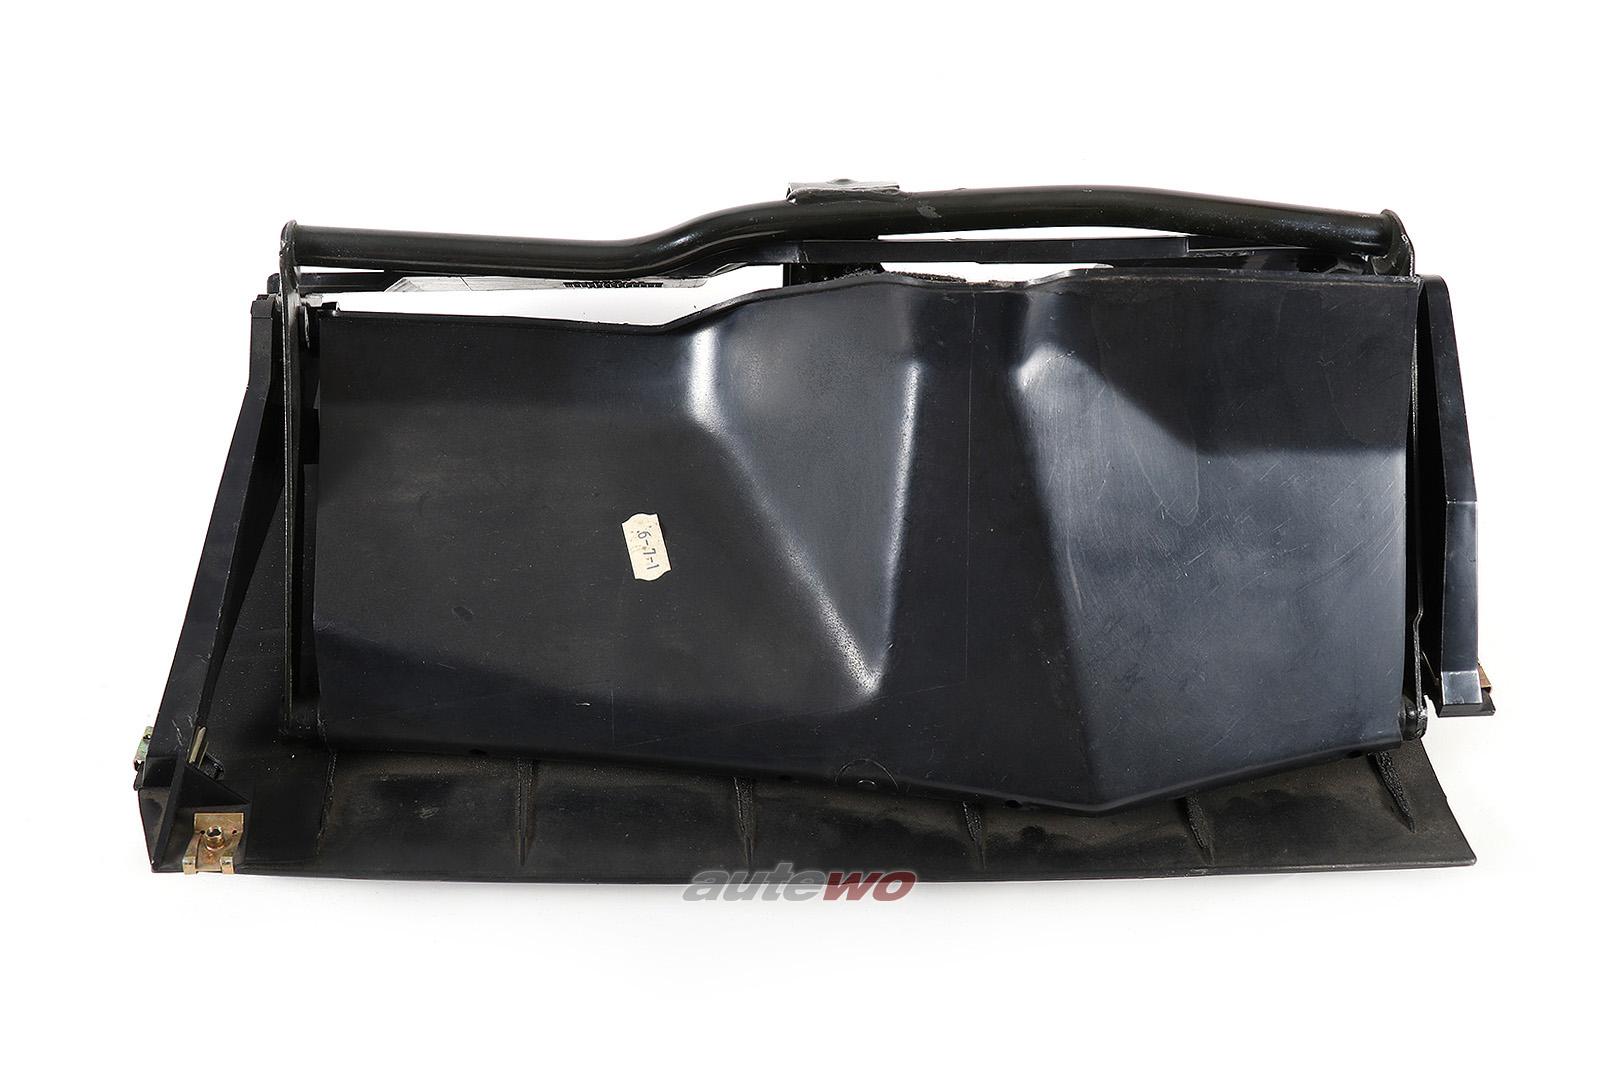 8A1857035C 8A1857035G Audi 80 B4/S2/RS2/Coupe/Cabrio Typ 89 Handschuhfach Klima